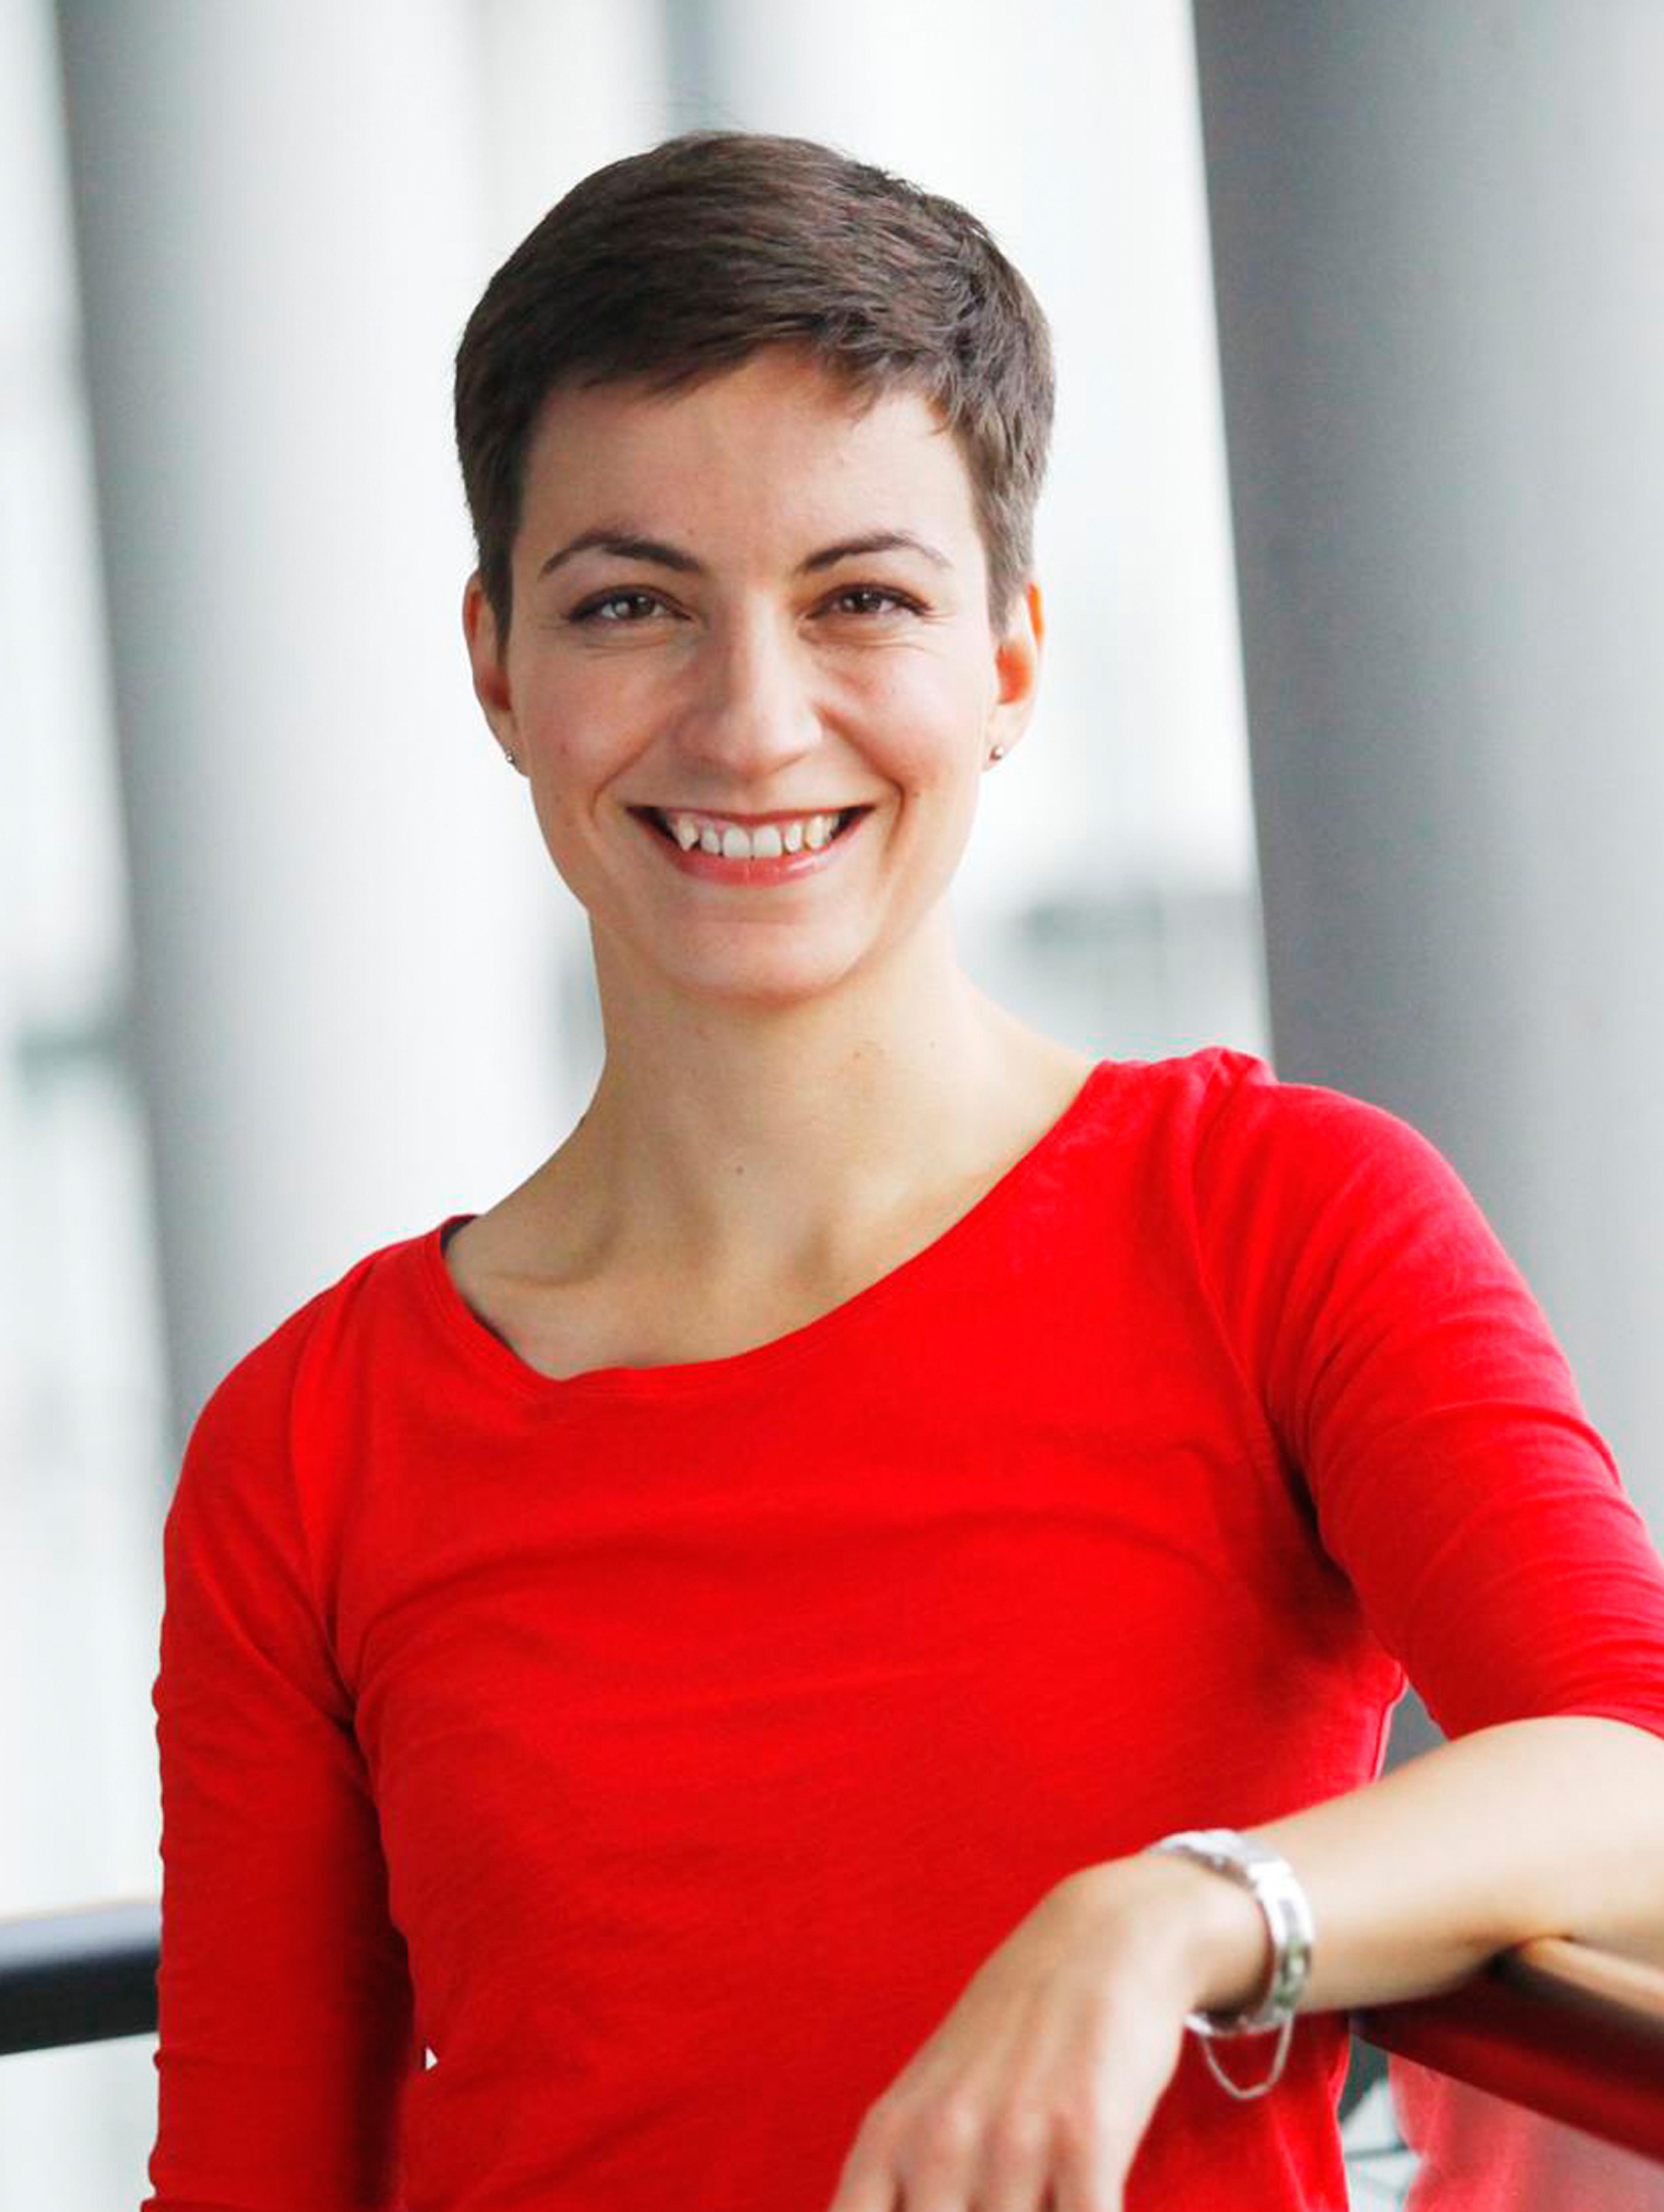 Ska Keller, Fraktionsvorsitzende der Grünen/EFA